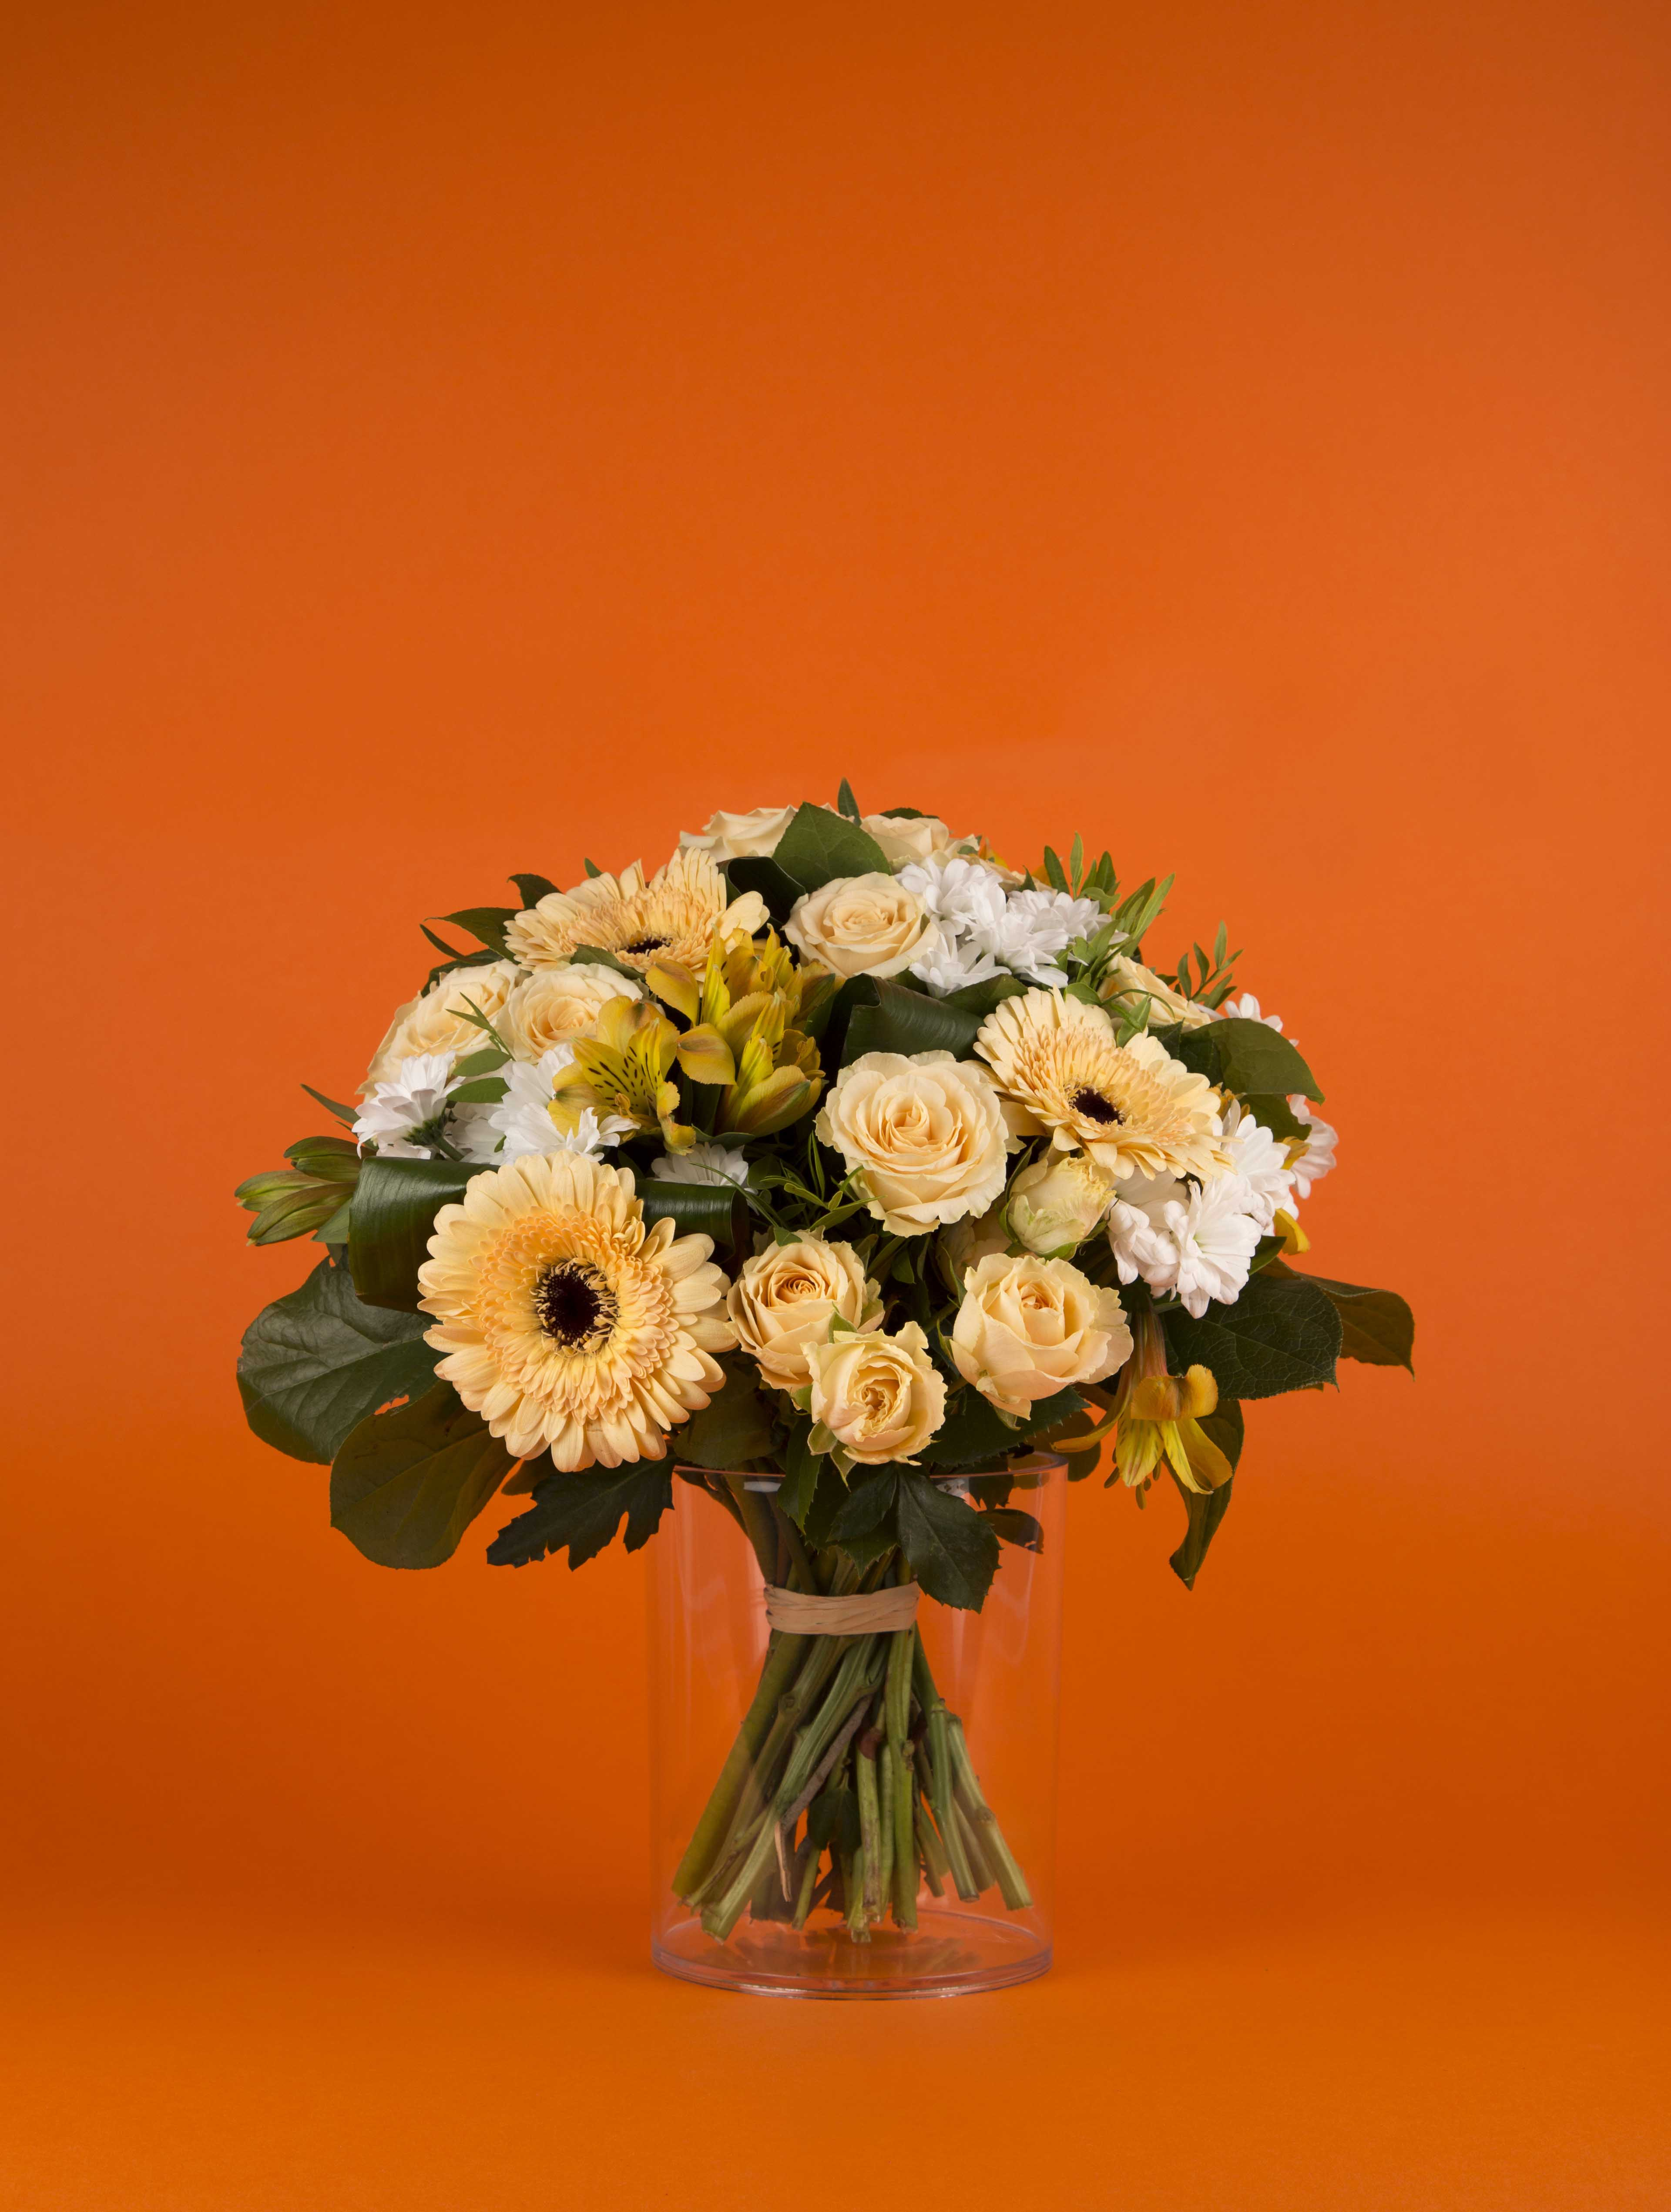 Bouquet de deuil - Dernier hommage